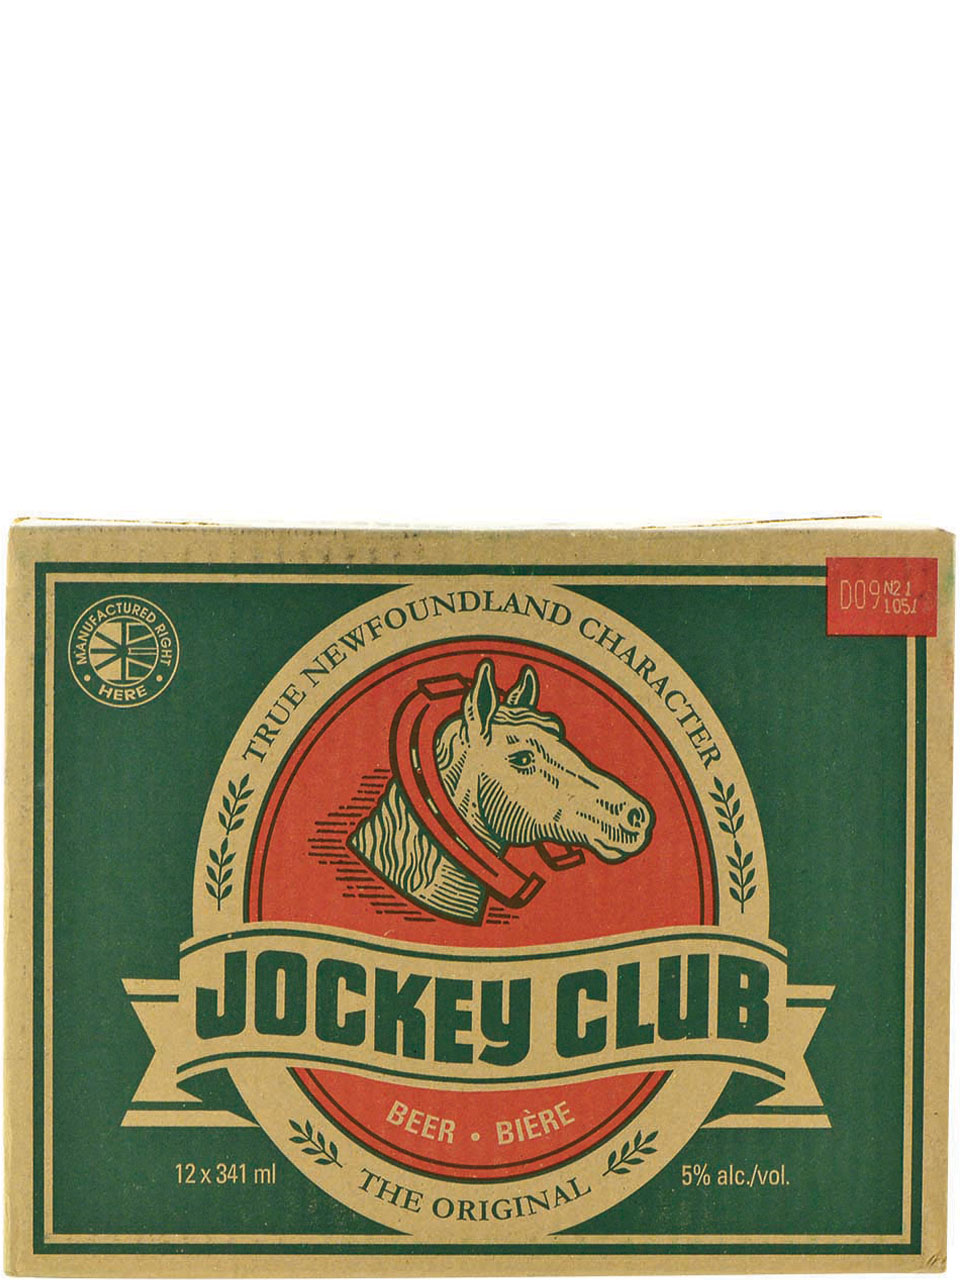 Jockey Club Bottles 12pk